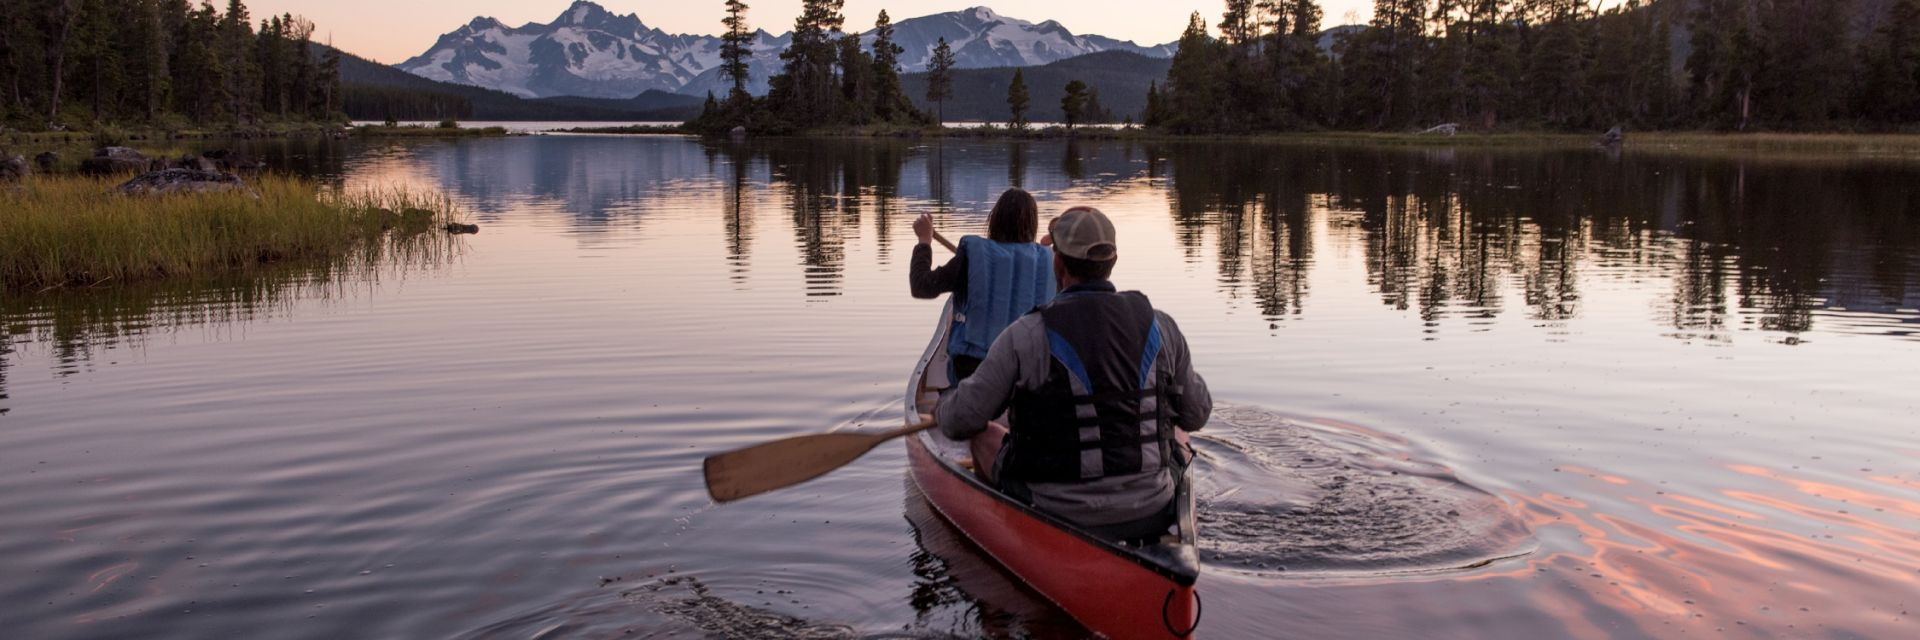 Nimpo Lake | Kari Medig